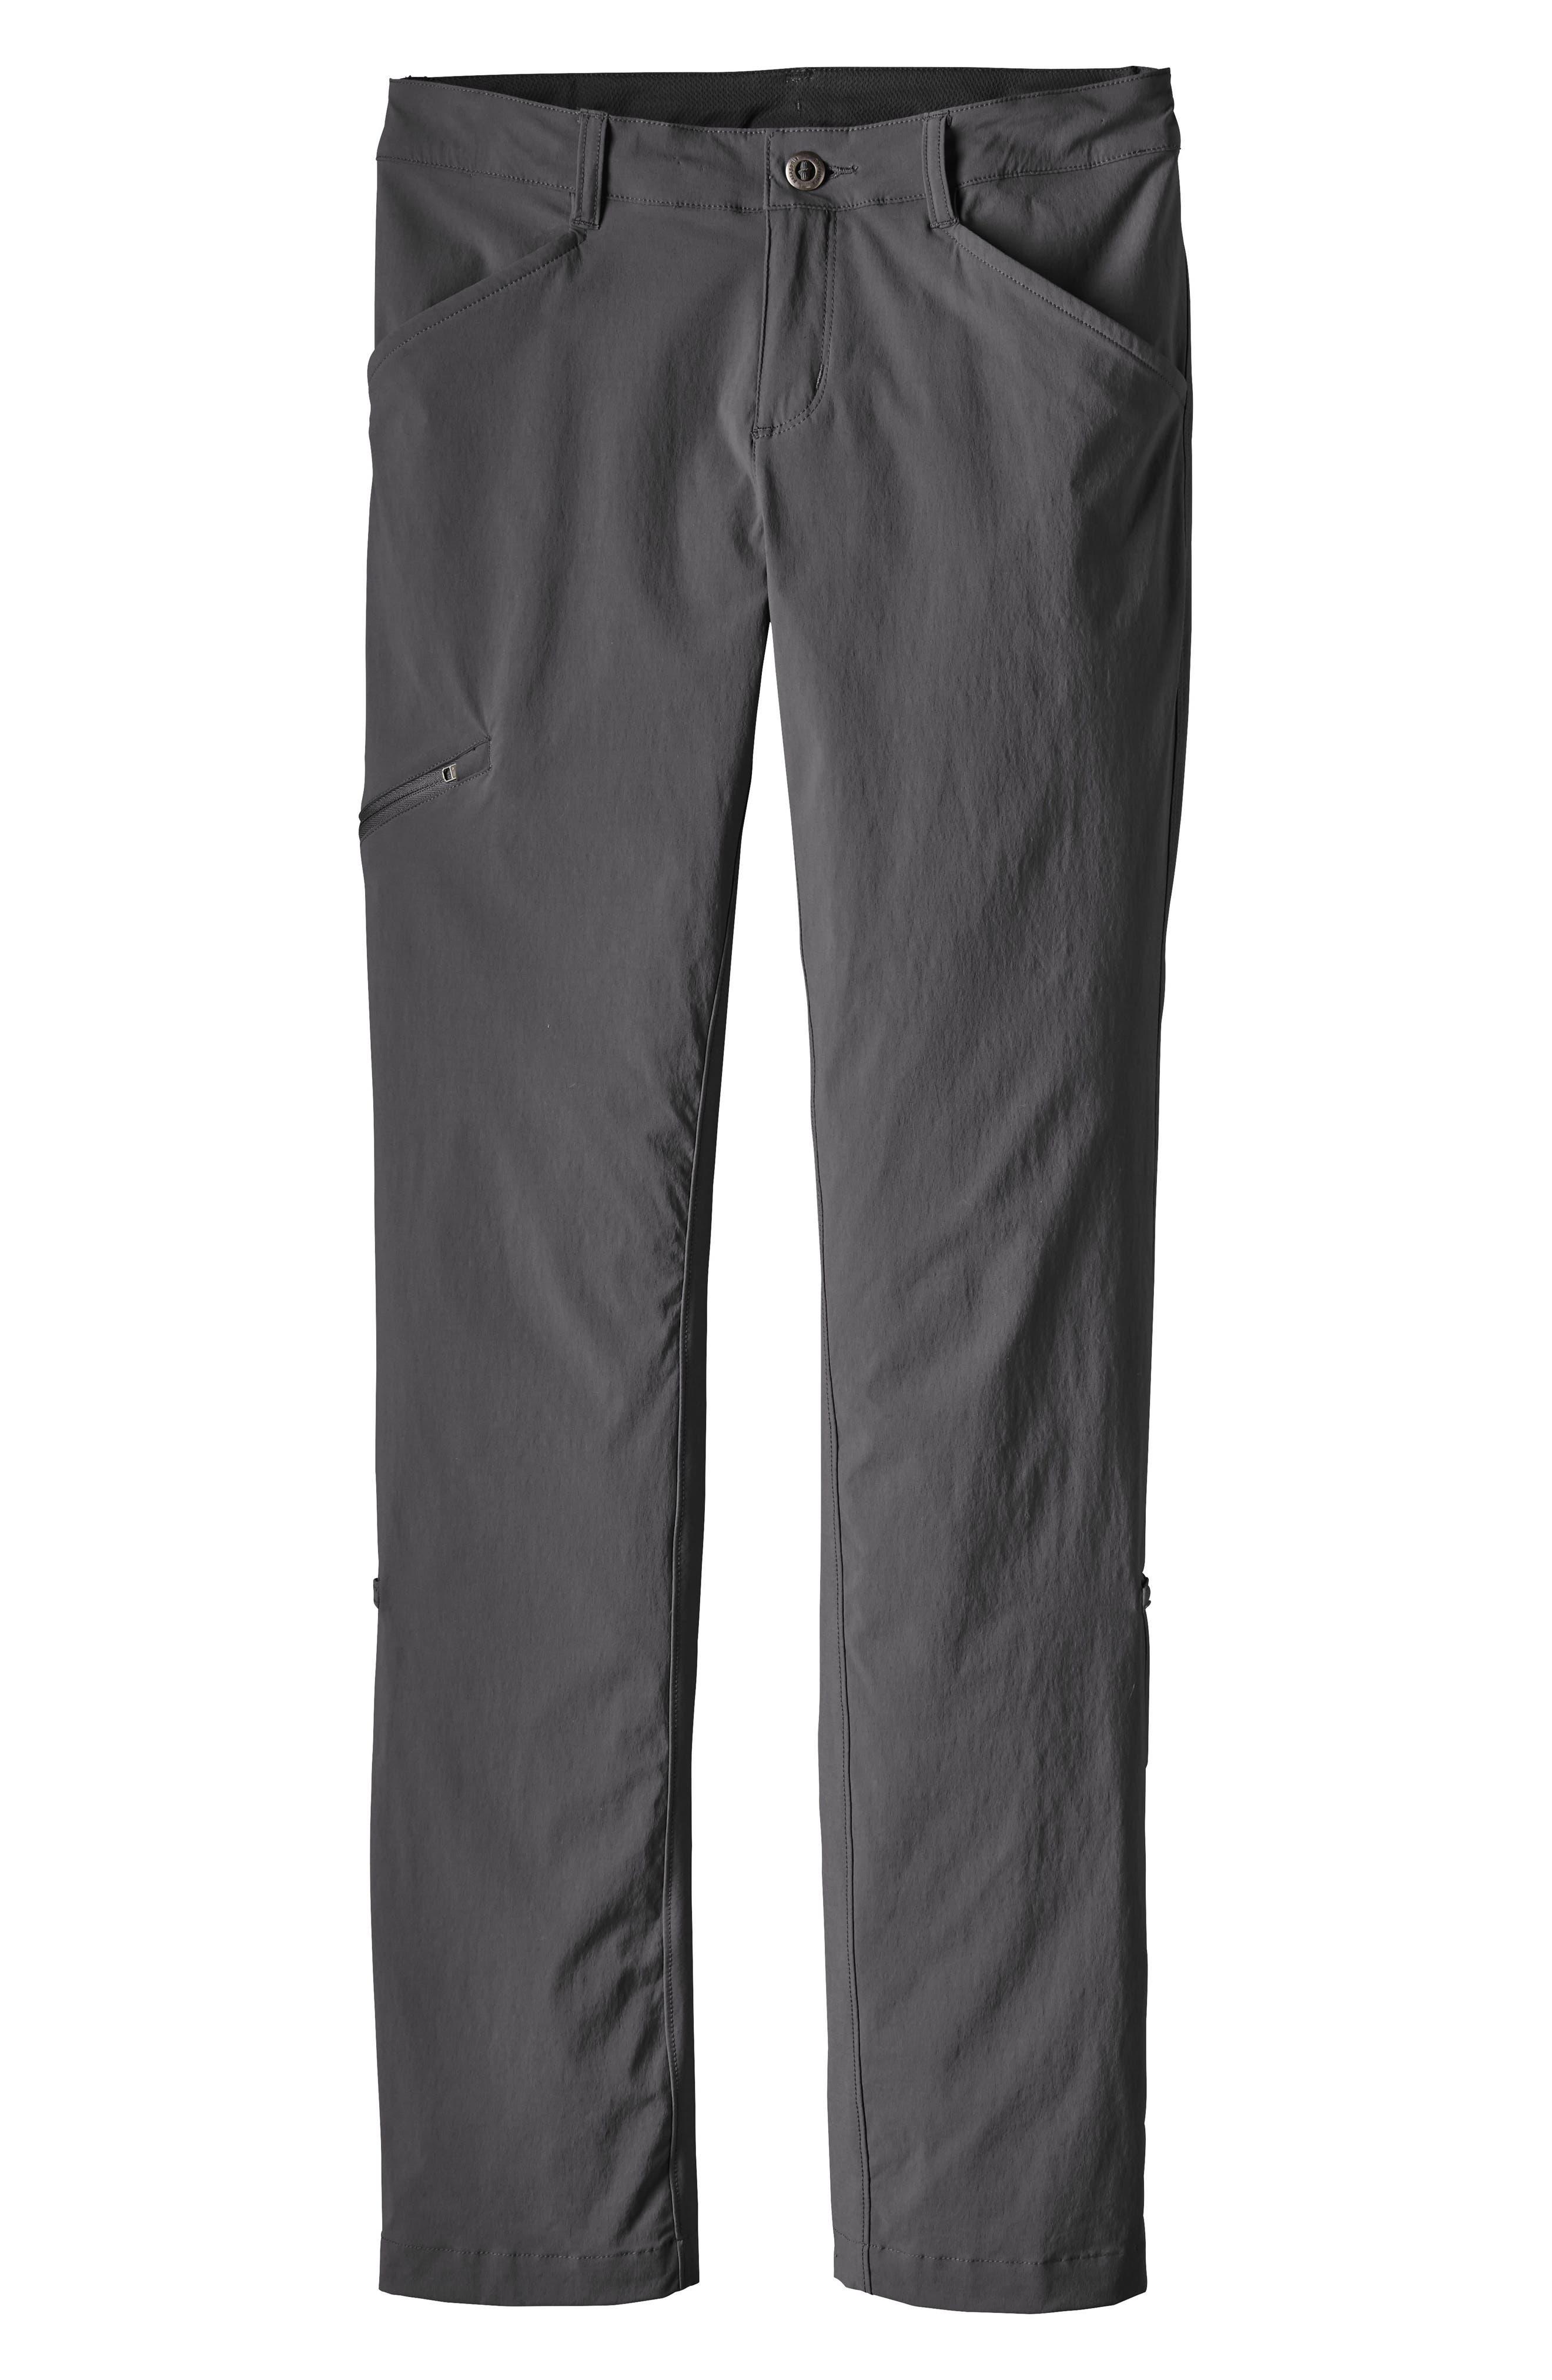 Patagonia Quandary Convertible Pants, Grey